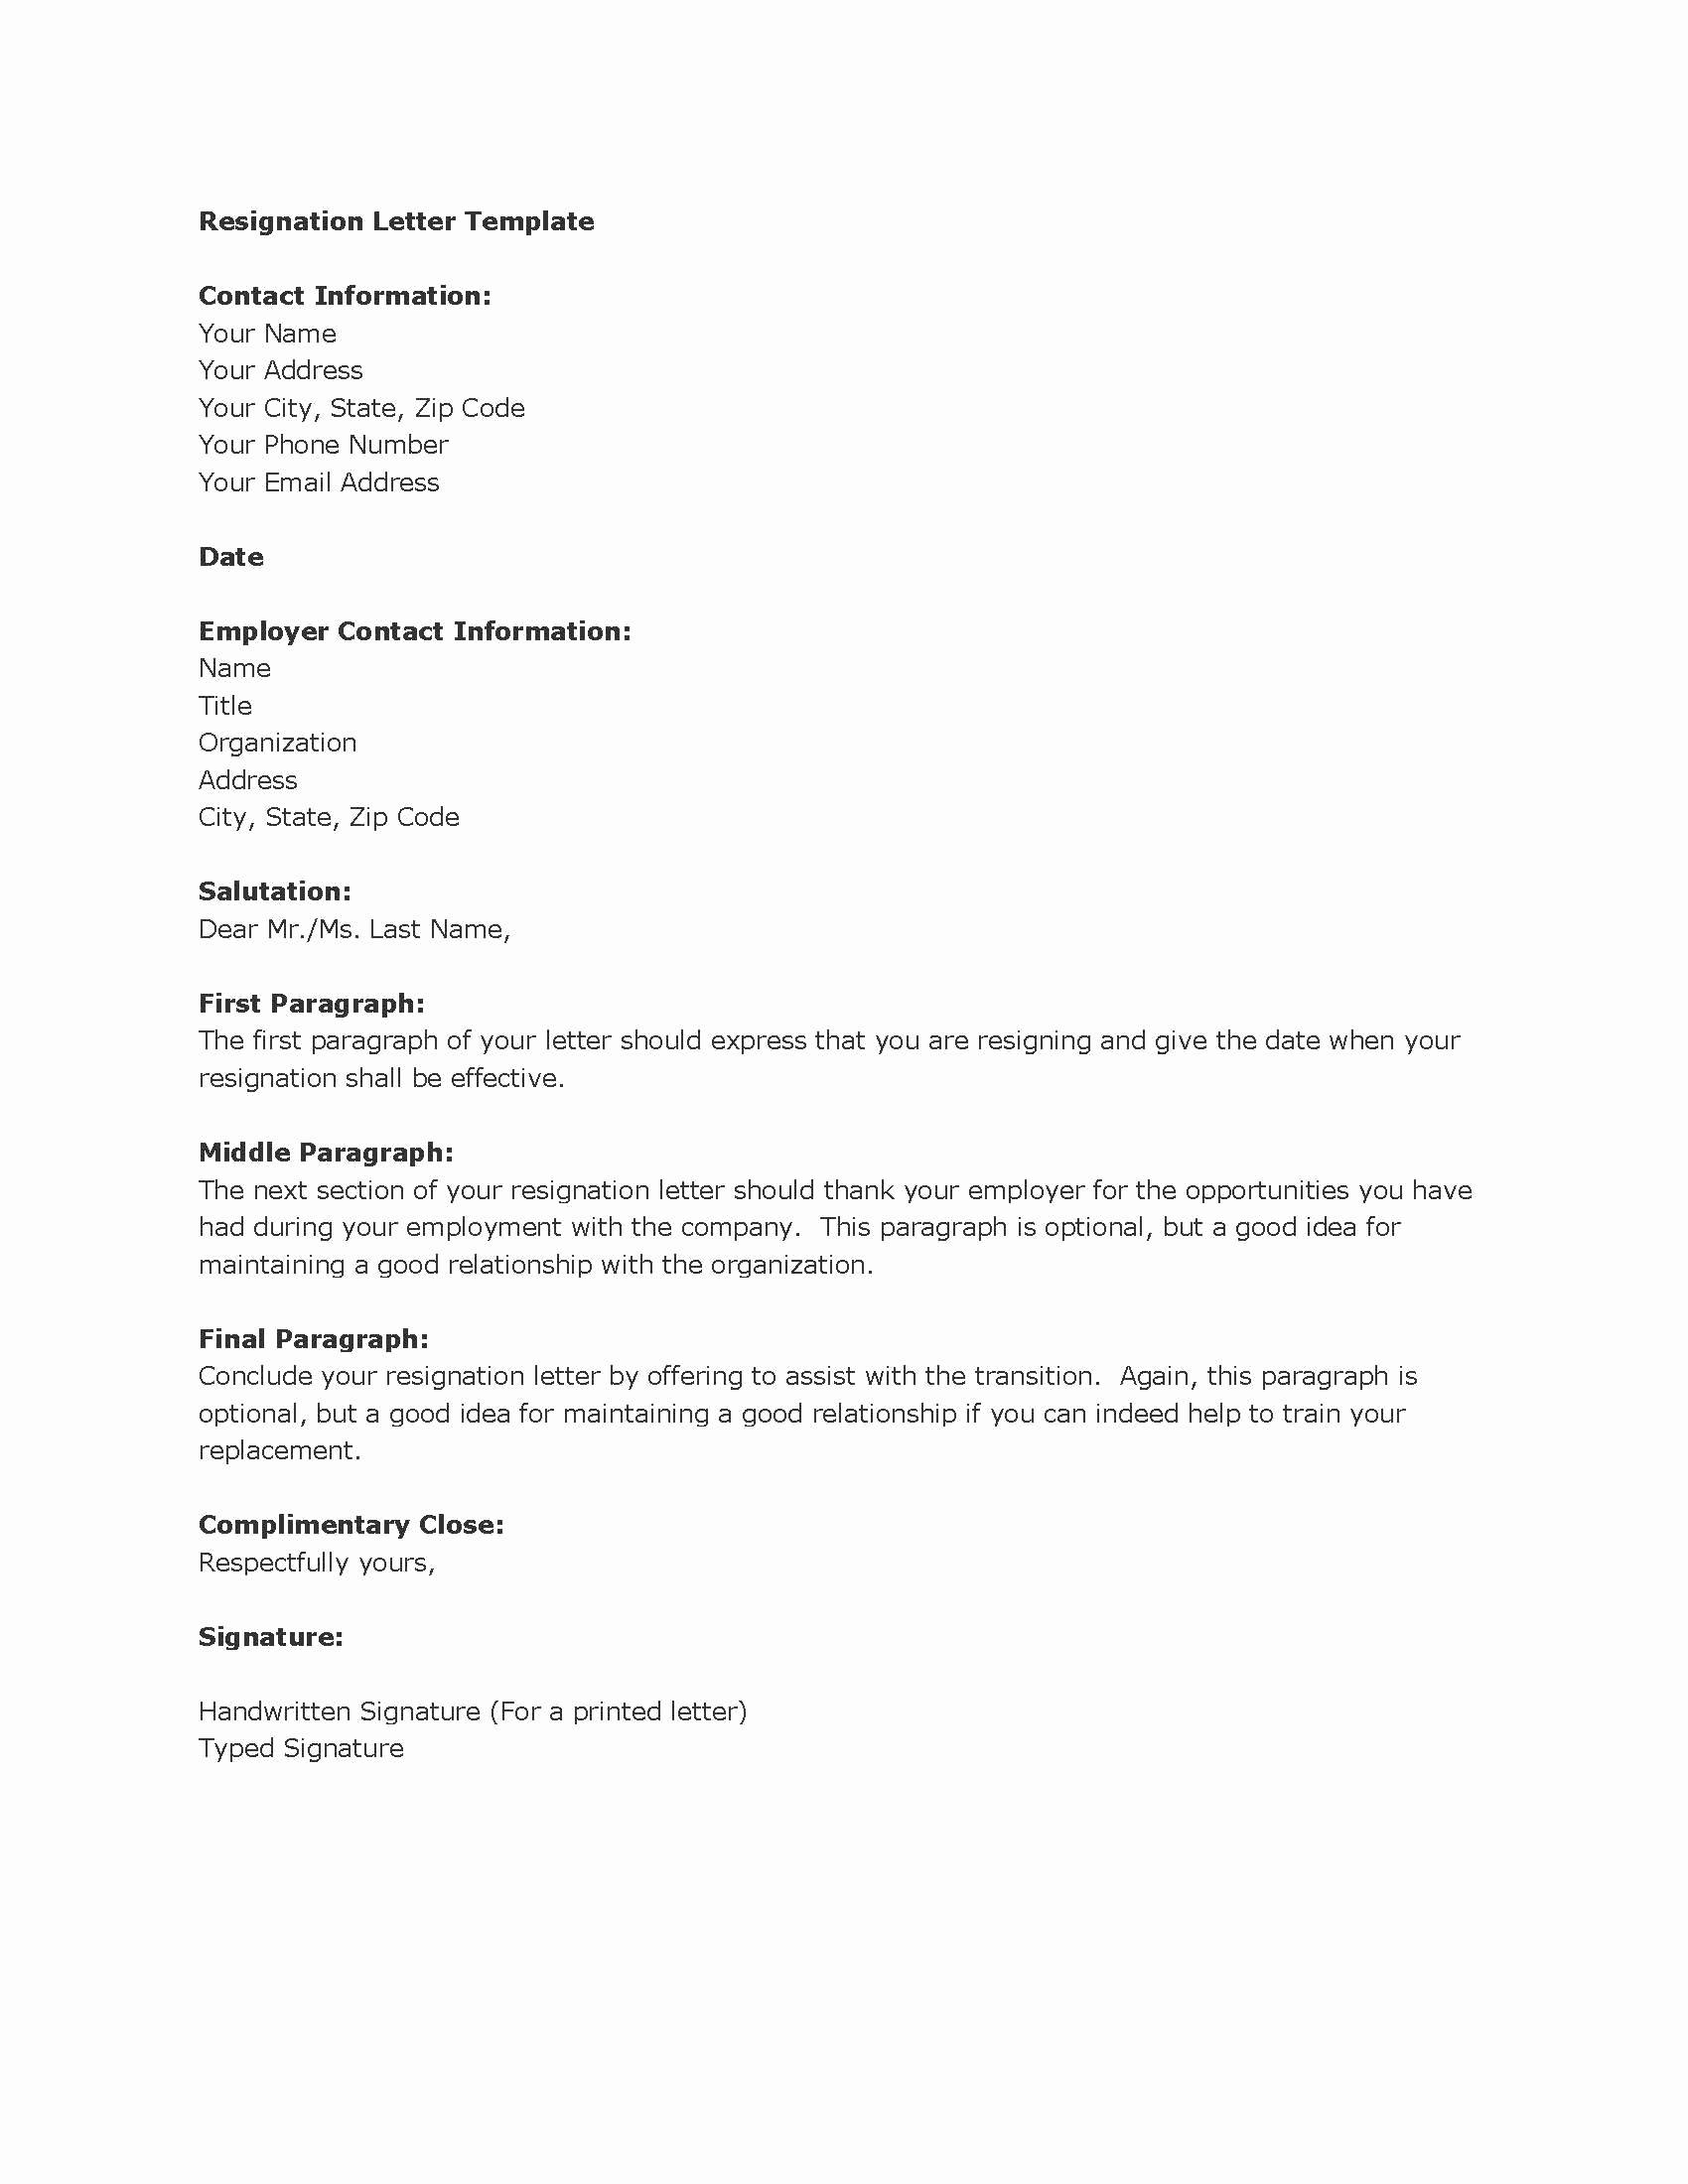 Resignation Letter Template Free Fresh Job Resignation Letter Sample Template